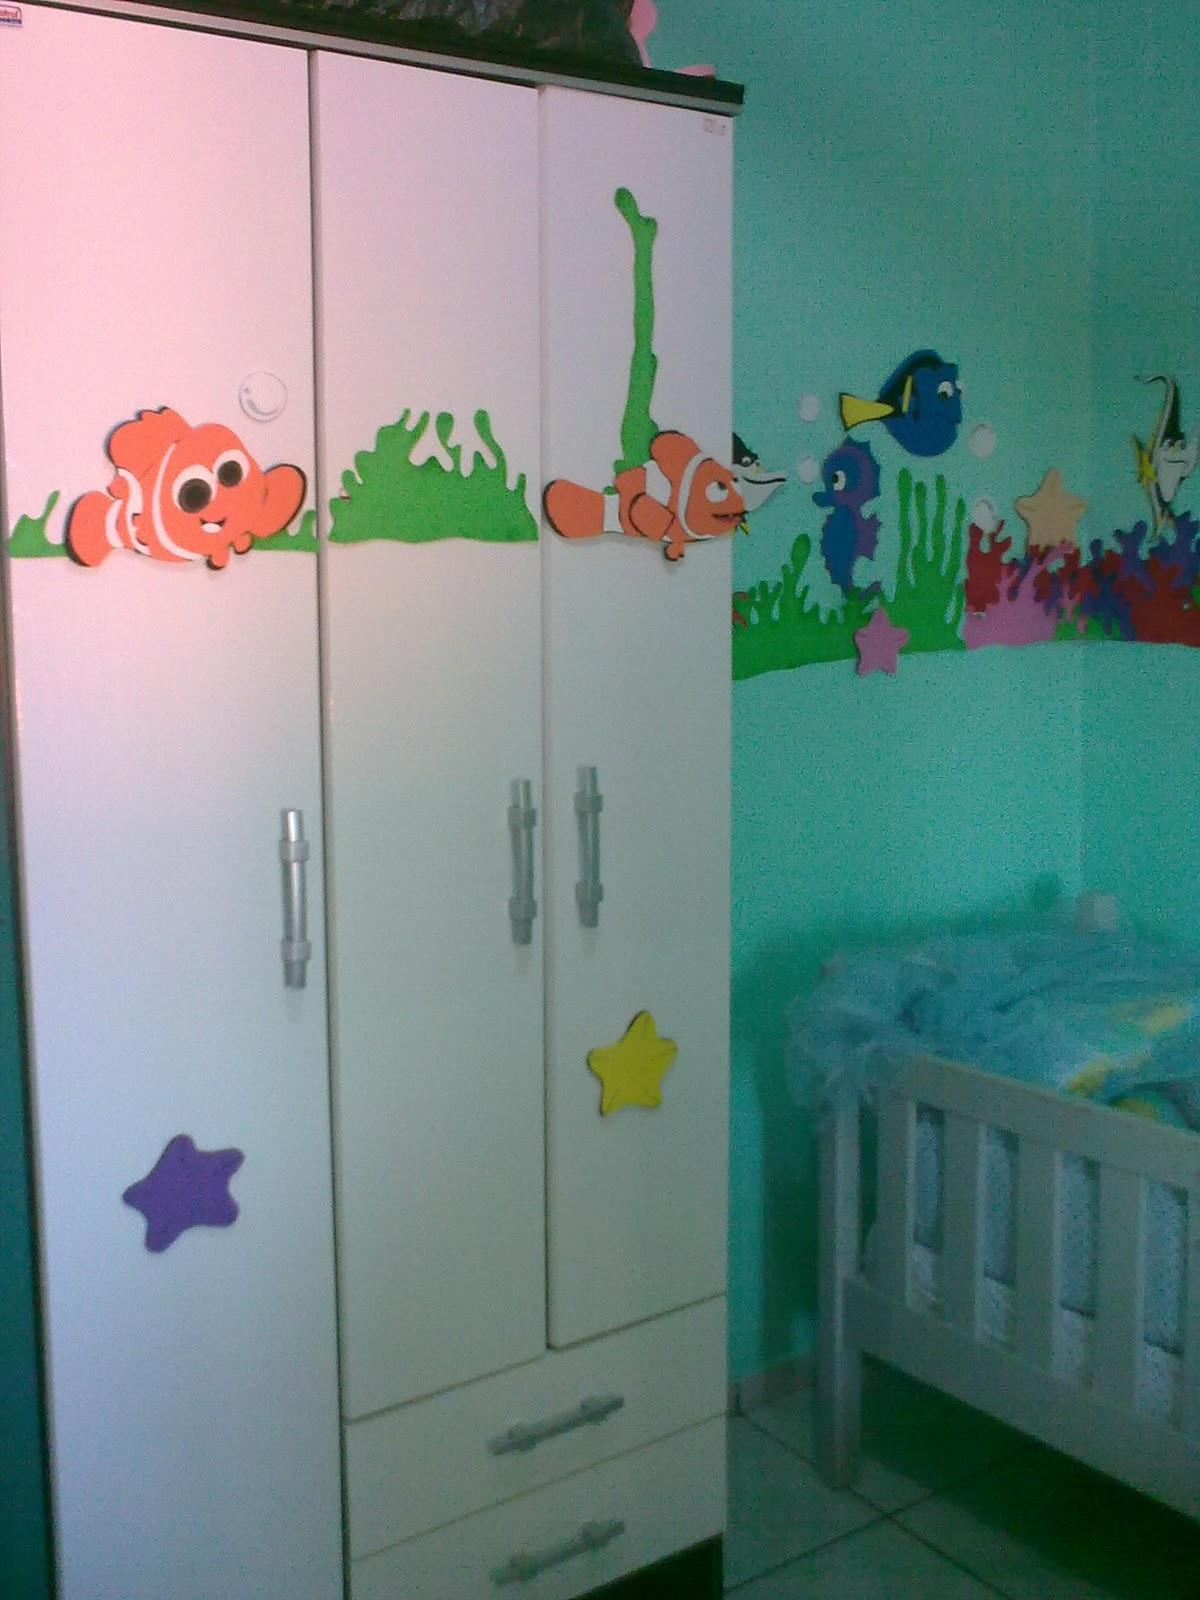 Enfeites Para Quarto De Bebe De Eva ~ Drykartes Enfeites feito de e v a para quarto de beb?